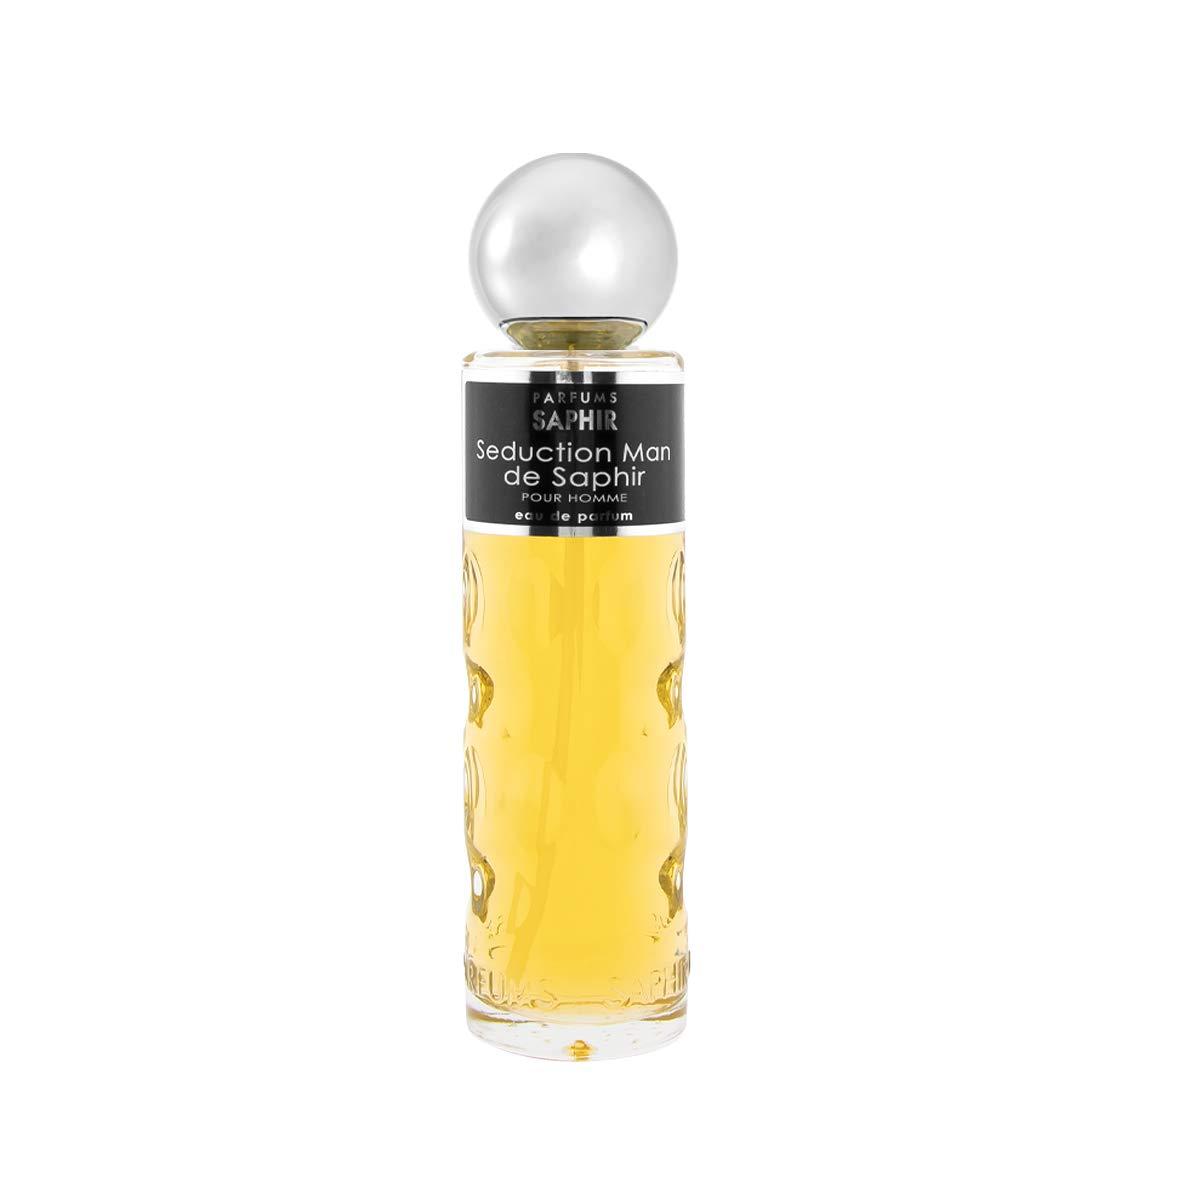 PARFUMS SAPHIR Seduction Man - Eau de Parfum con vaporizador para Hombre - 200 ml